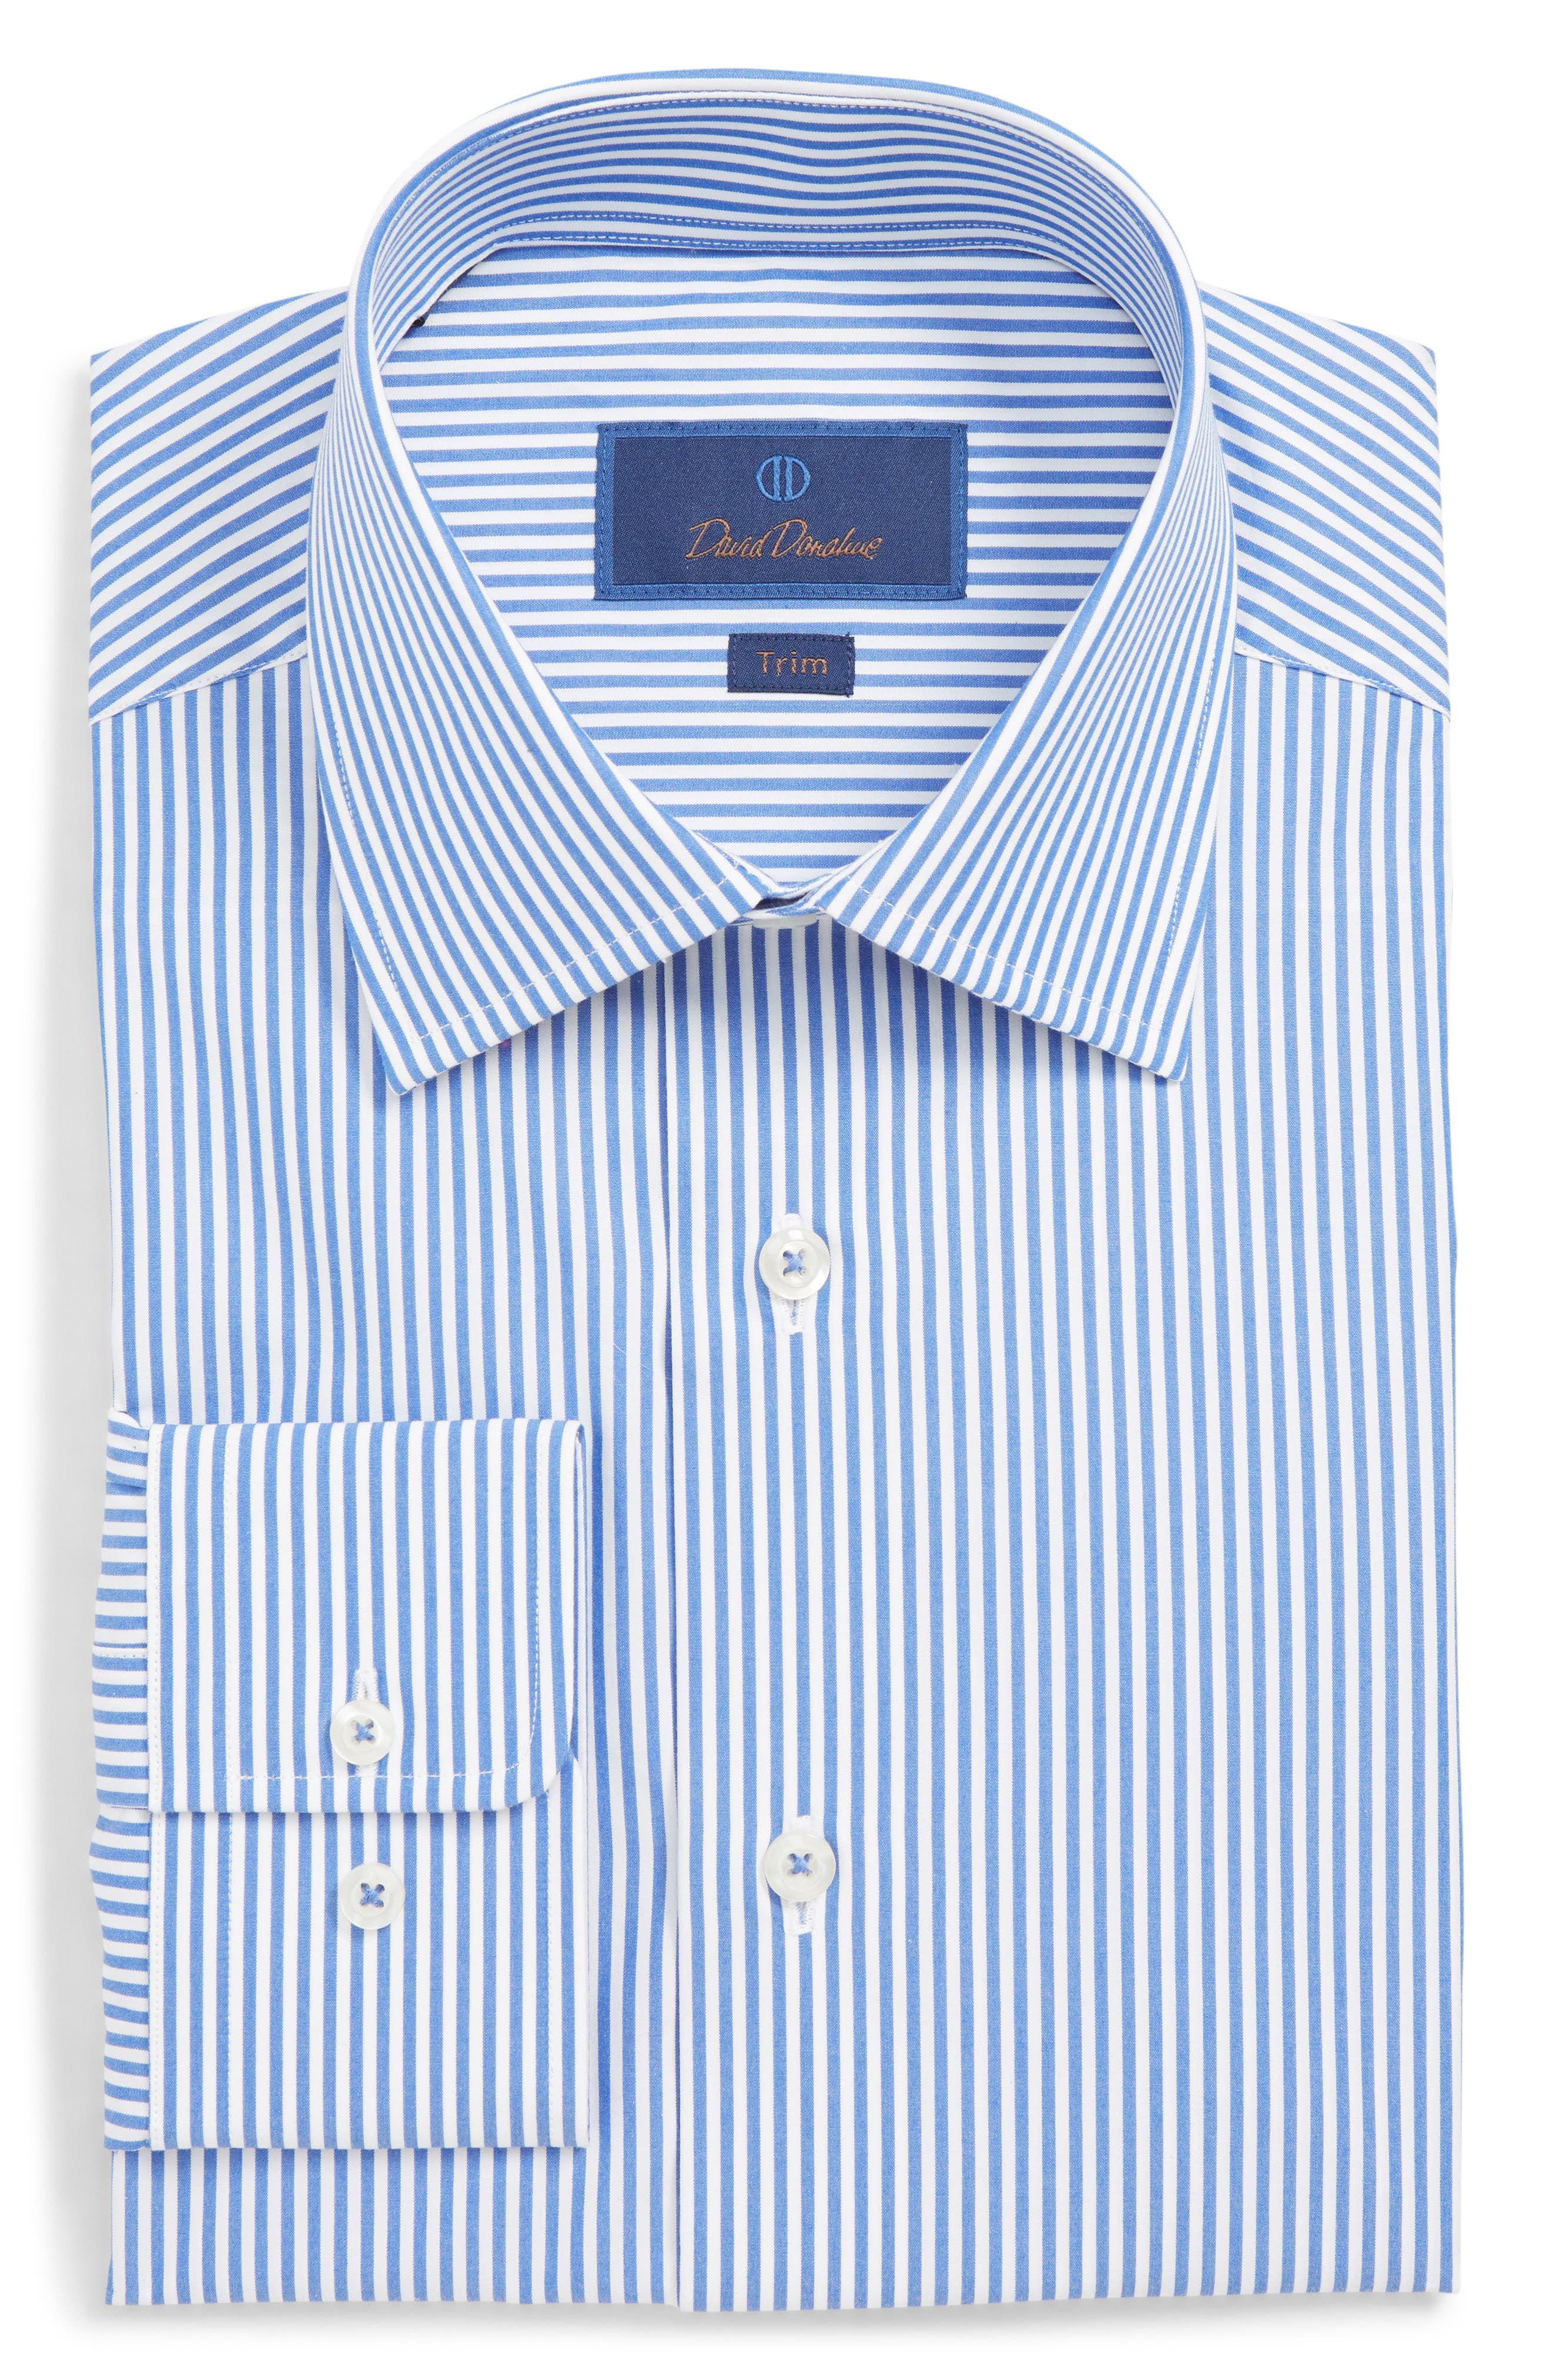 David Donahue Mens Brass Dress Shirt Collar Stays Package Of 18